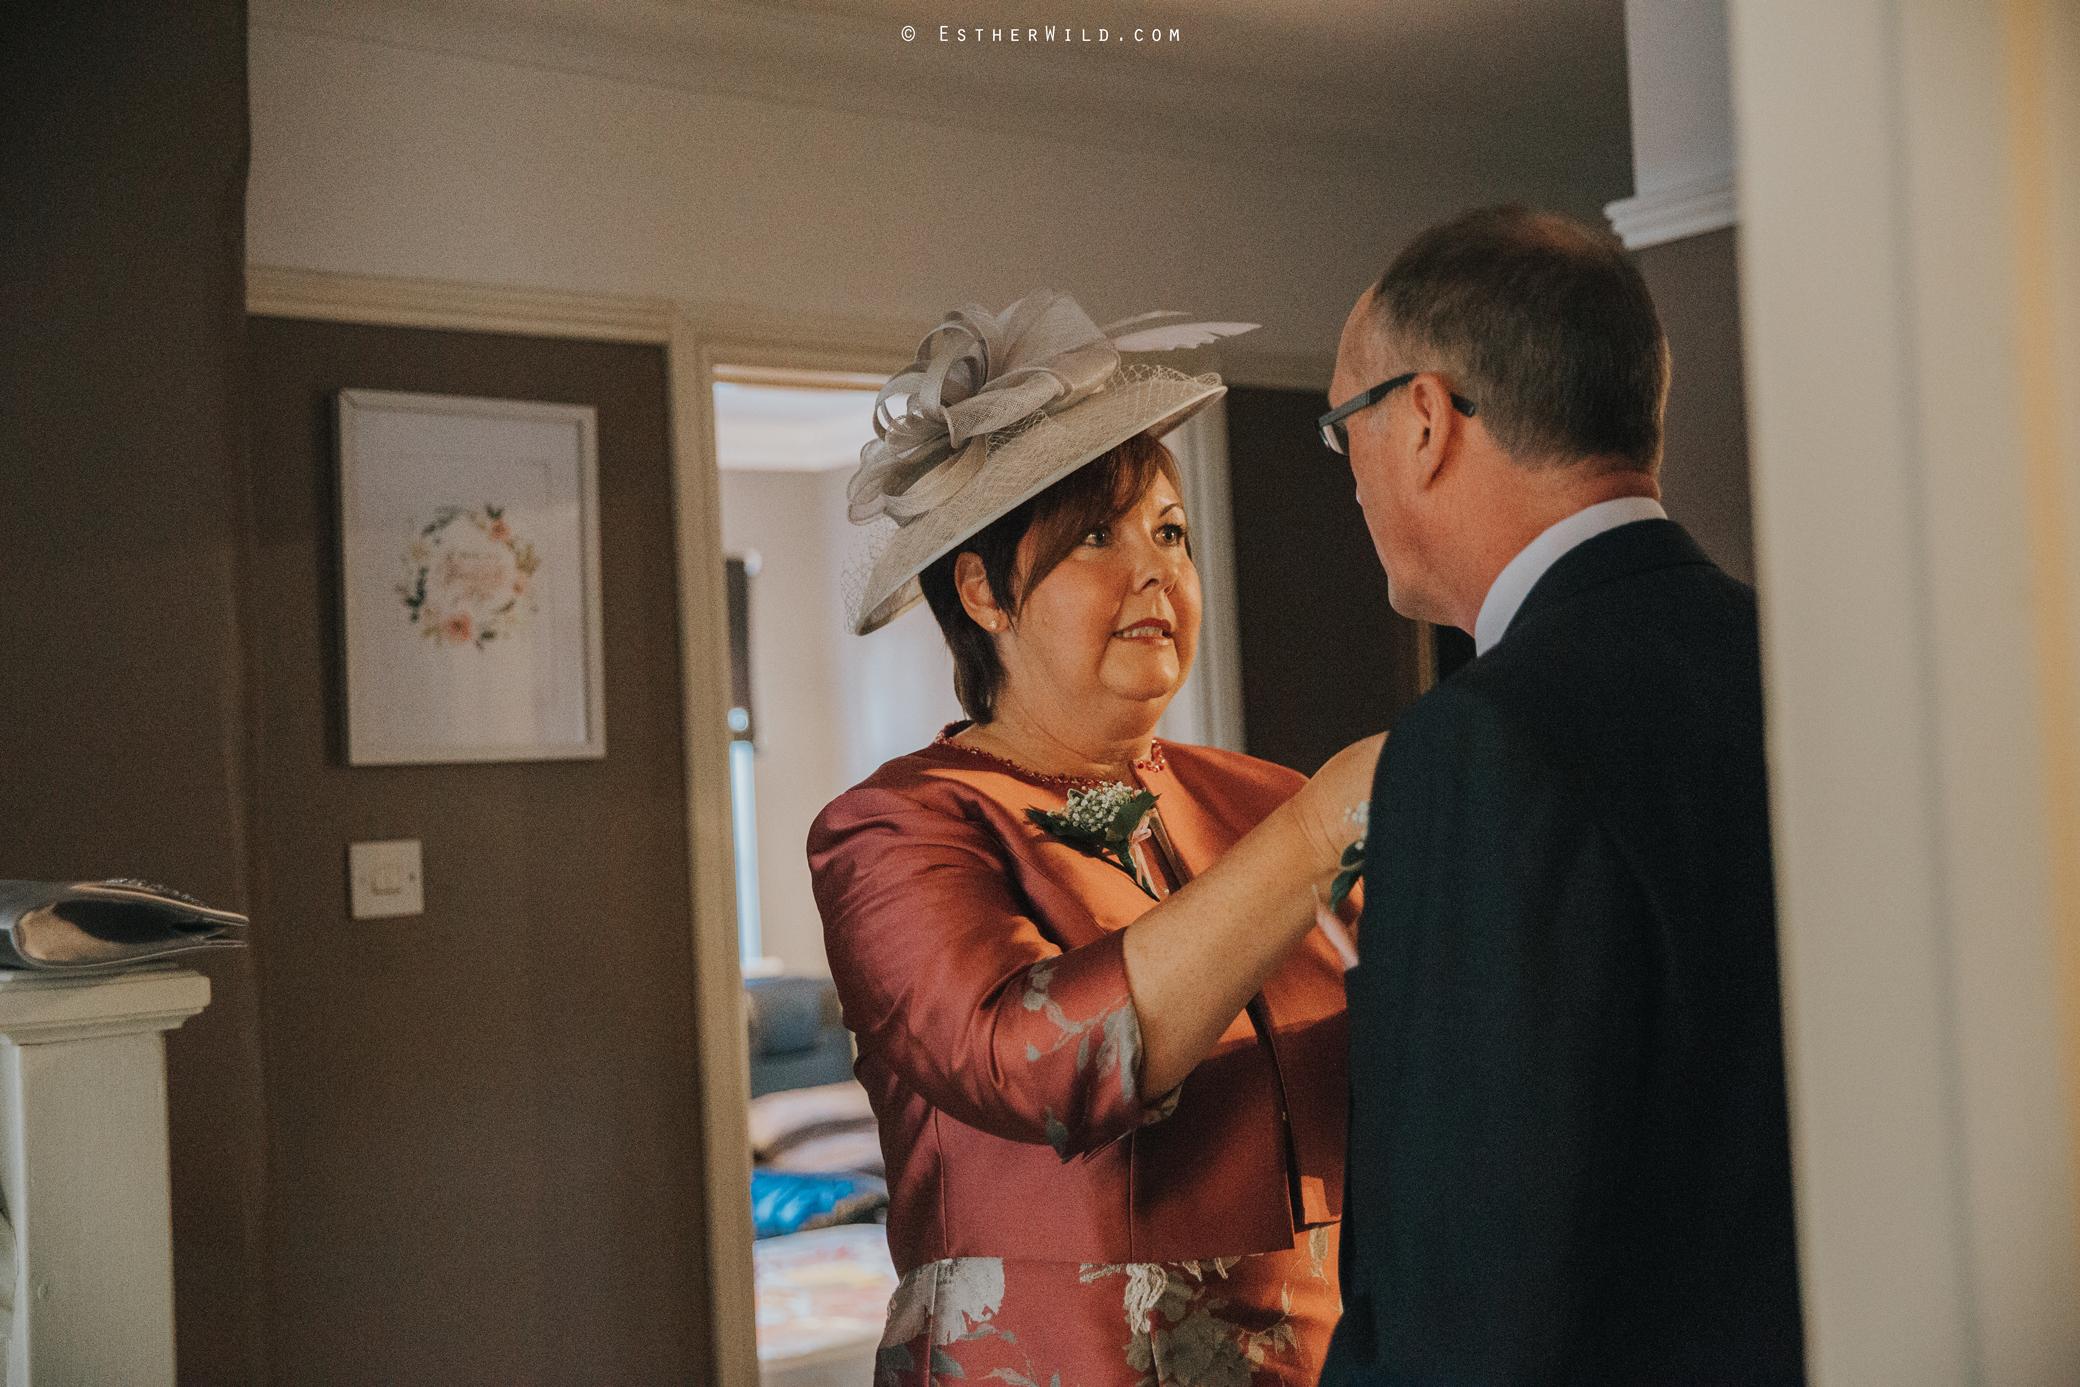 Wedding_Kings_Lynn_Town_Hall_Norfolk_Photographer_Esther_Wild_IMG_0625.jpg